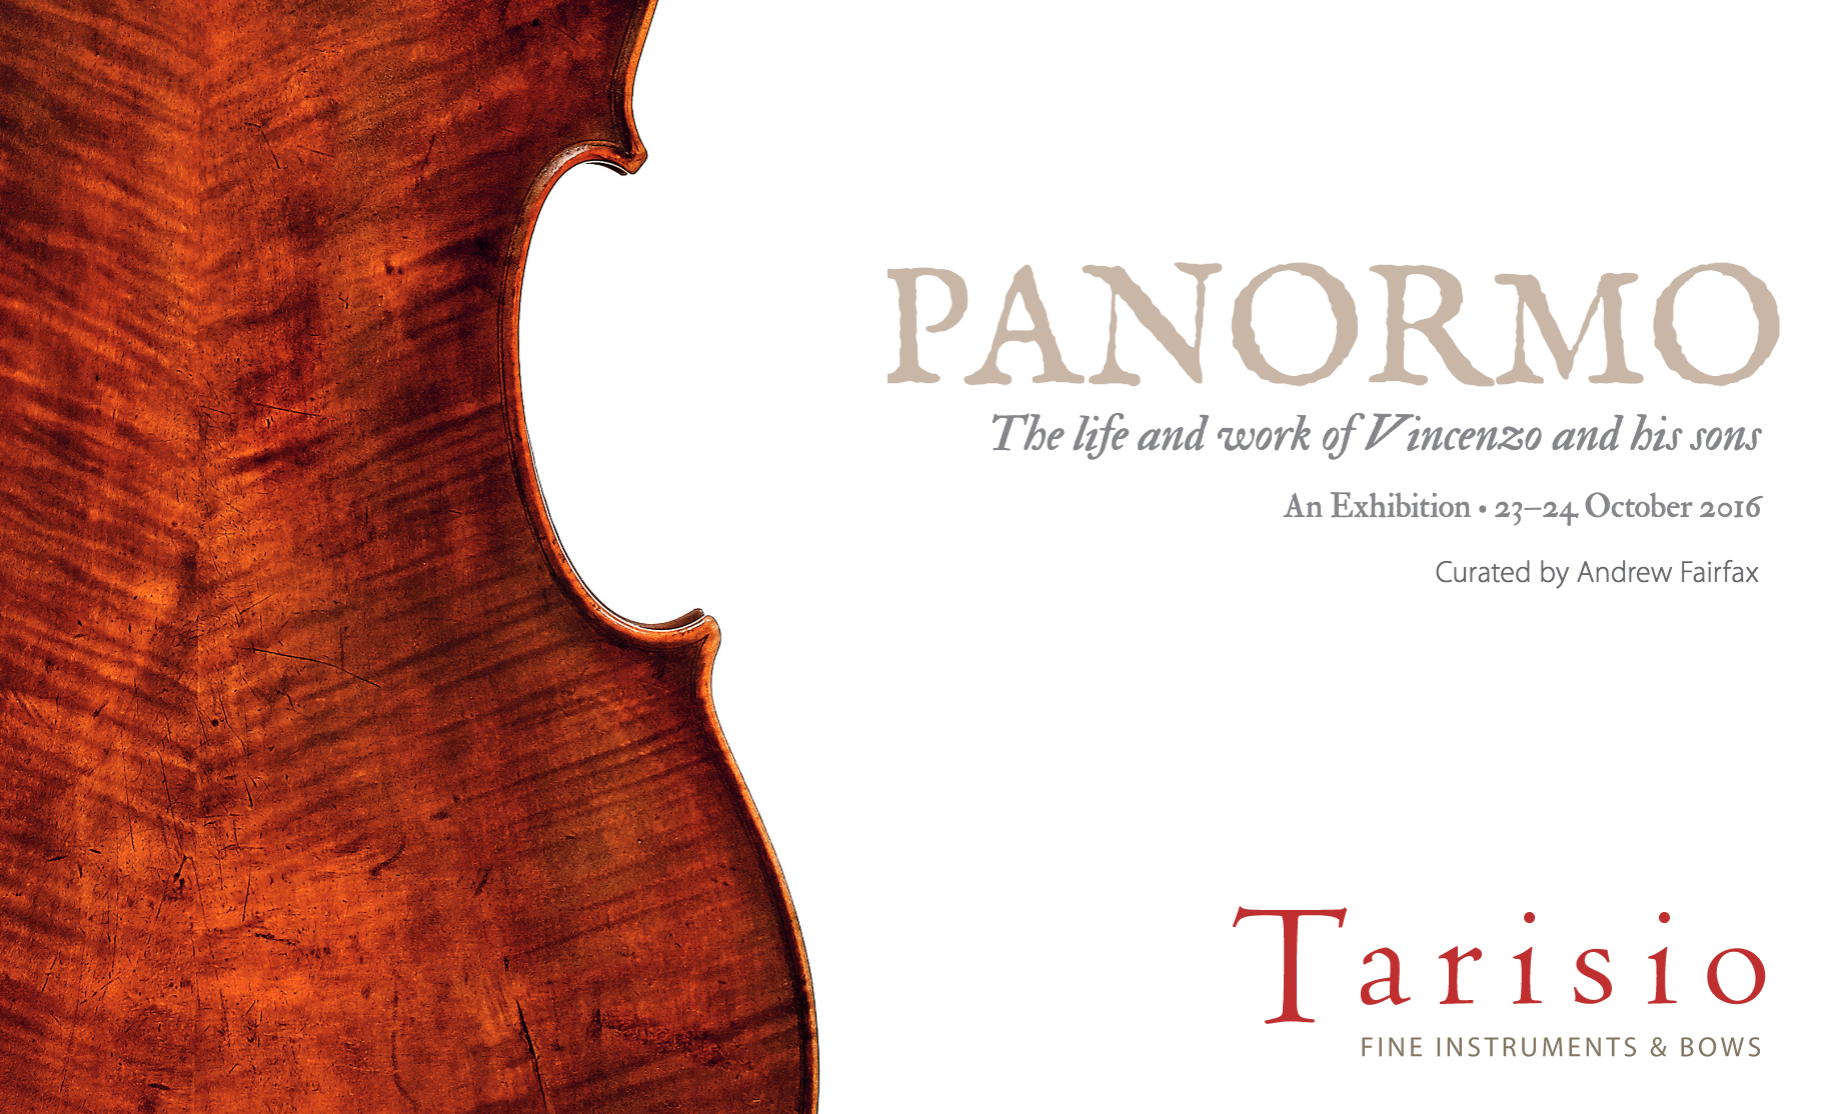 Panormo Exhibition Tarisio